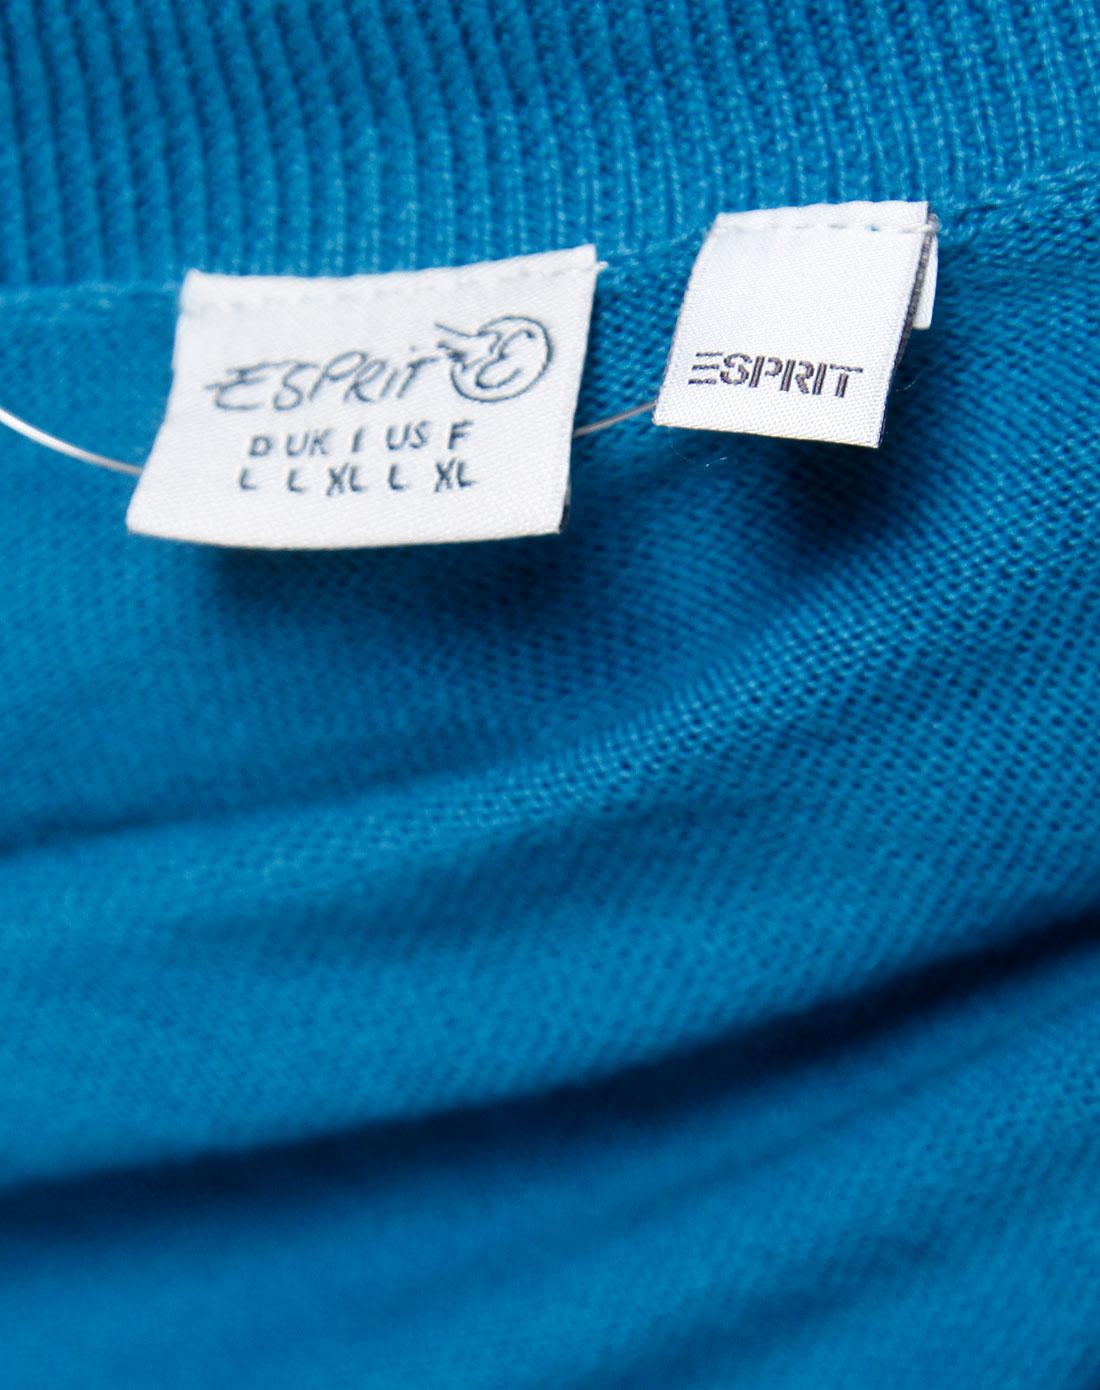 Esprit 女款海蓝色樽领长袖针织衫 埃斯普利特Esprit官网特价2.5图片